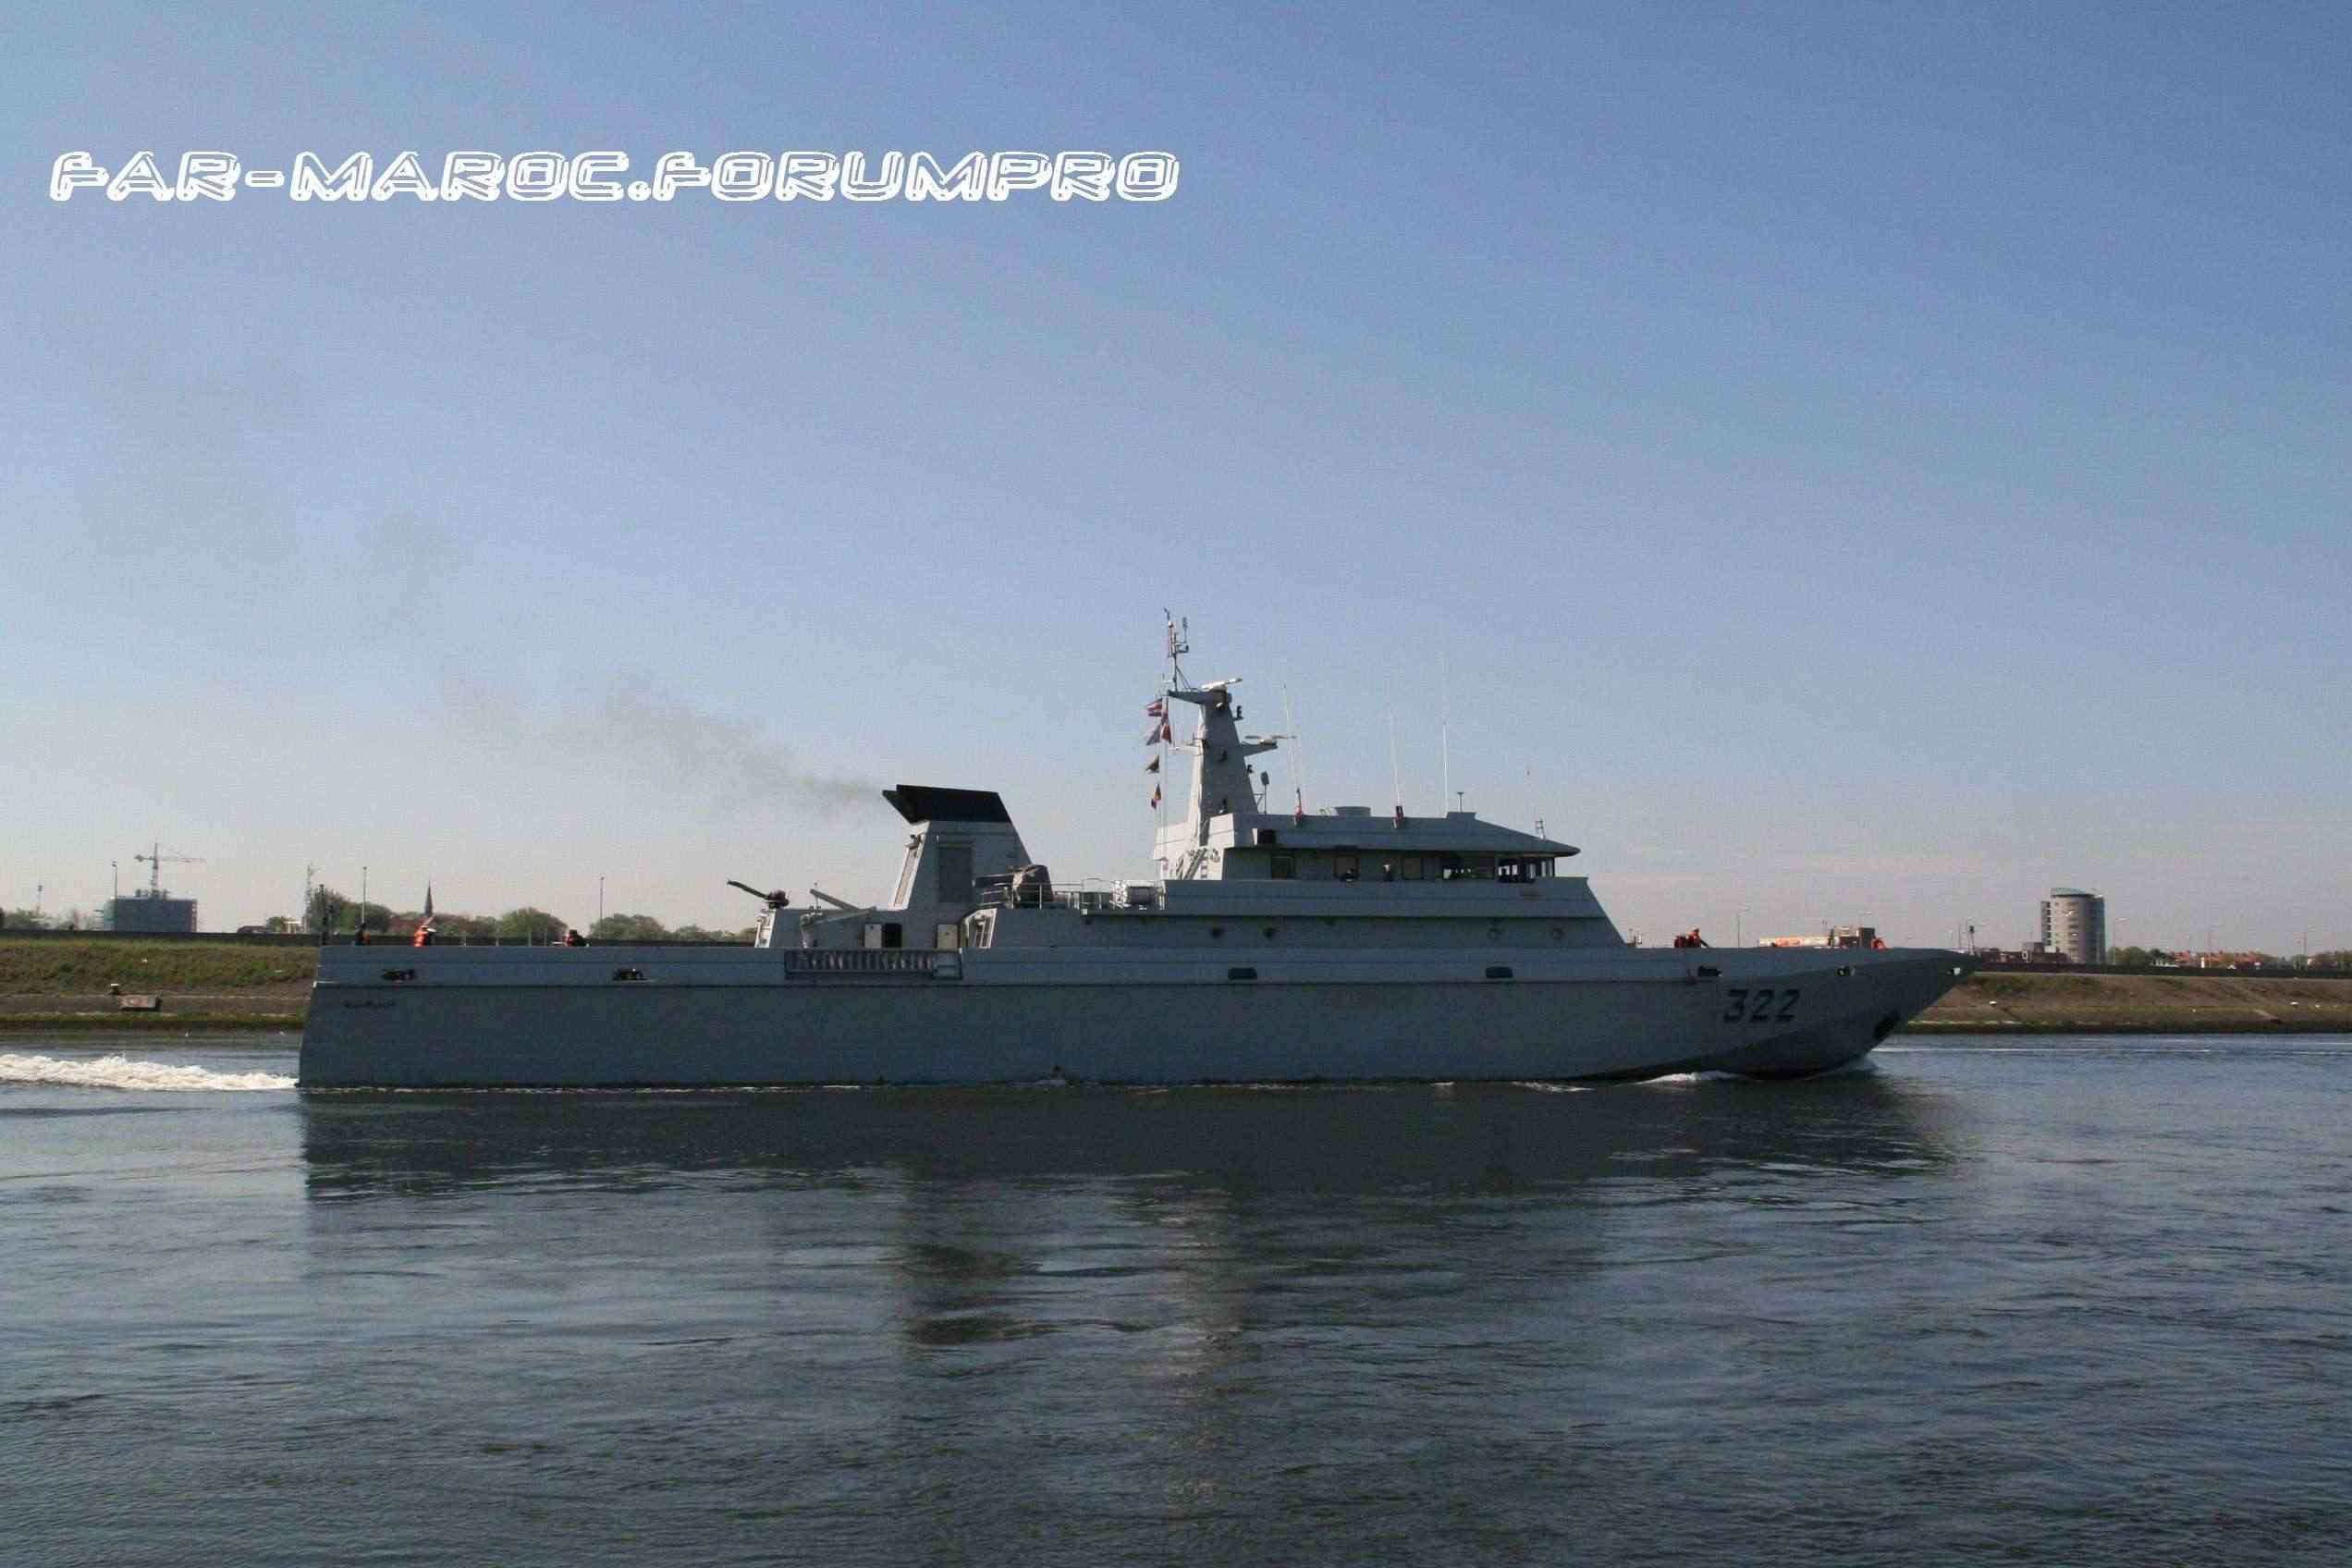 Royal Moroccan Navy Patrol Boats / Patrouilleurs de la Marine Marocaine - Page 2 Shipph15